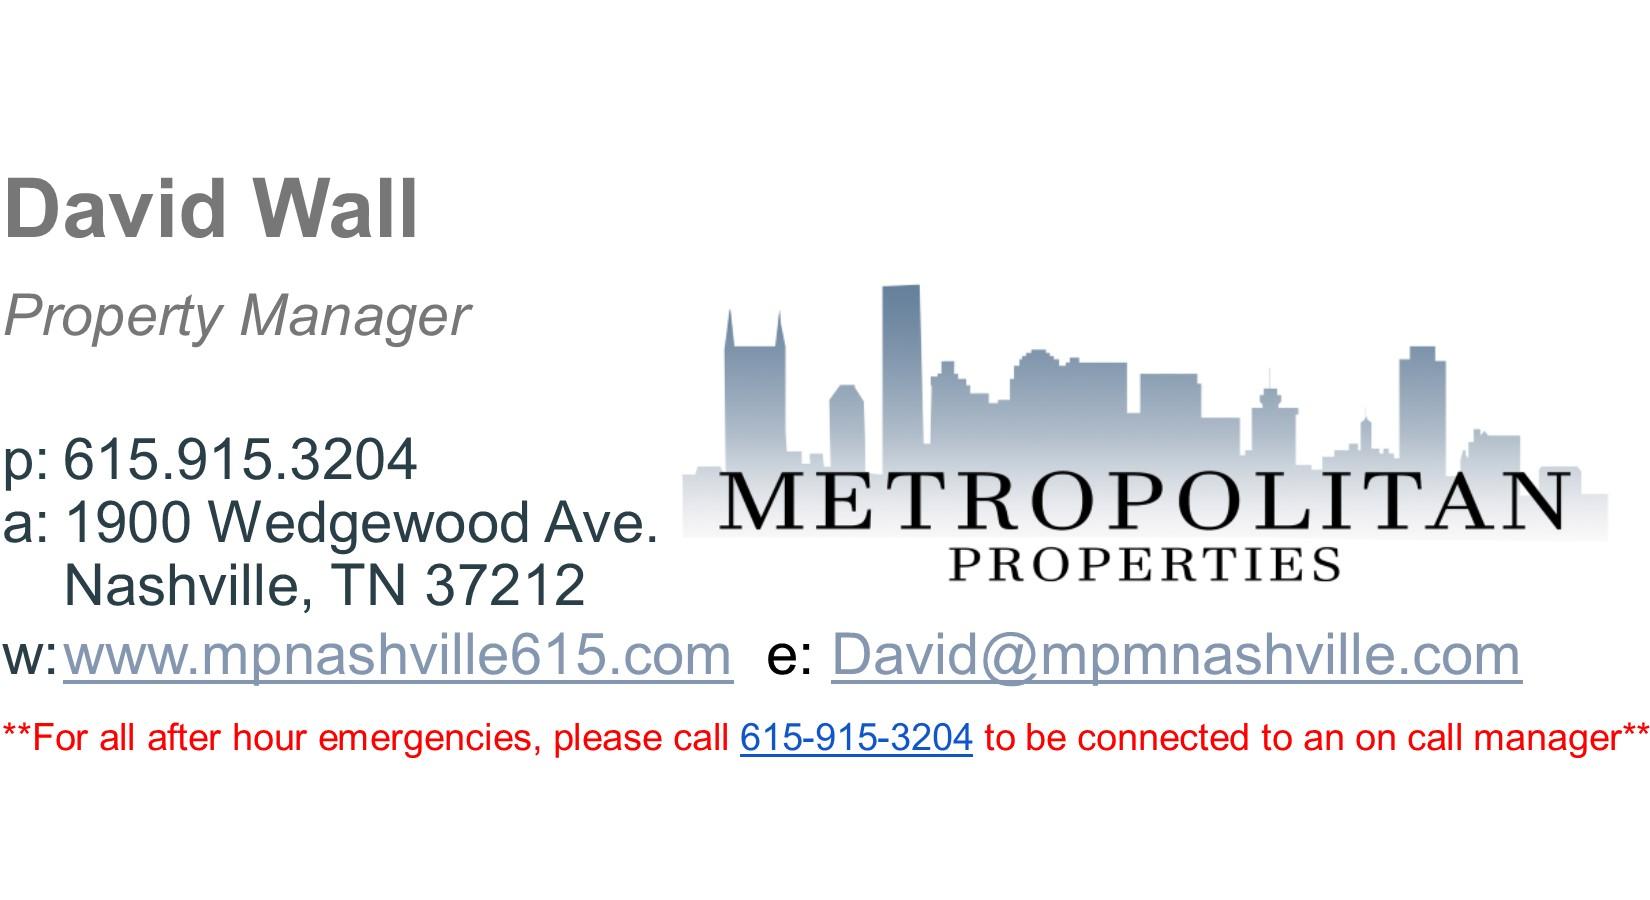 Business cards metropolitan properties colourmoves